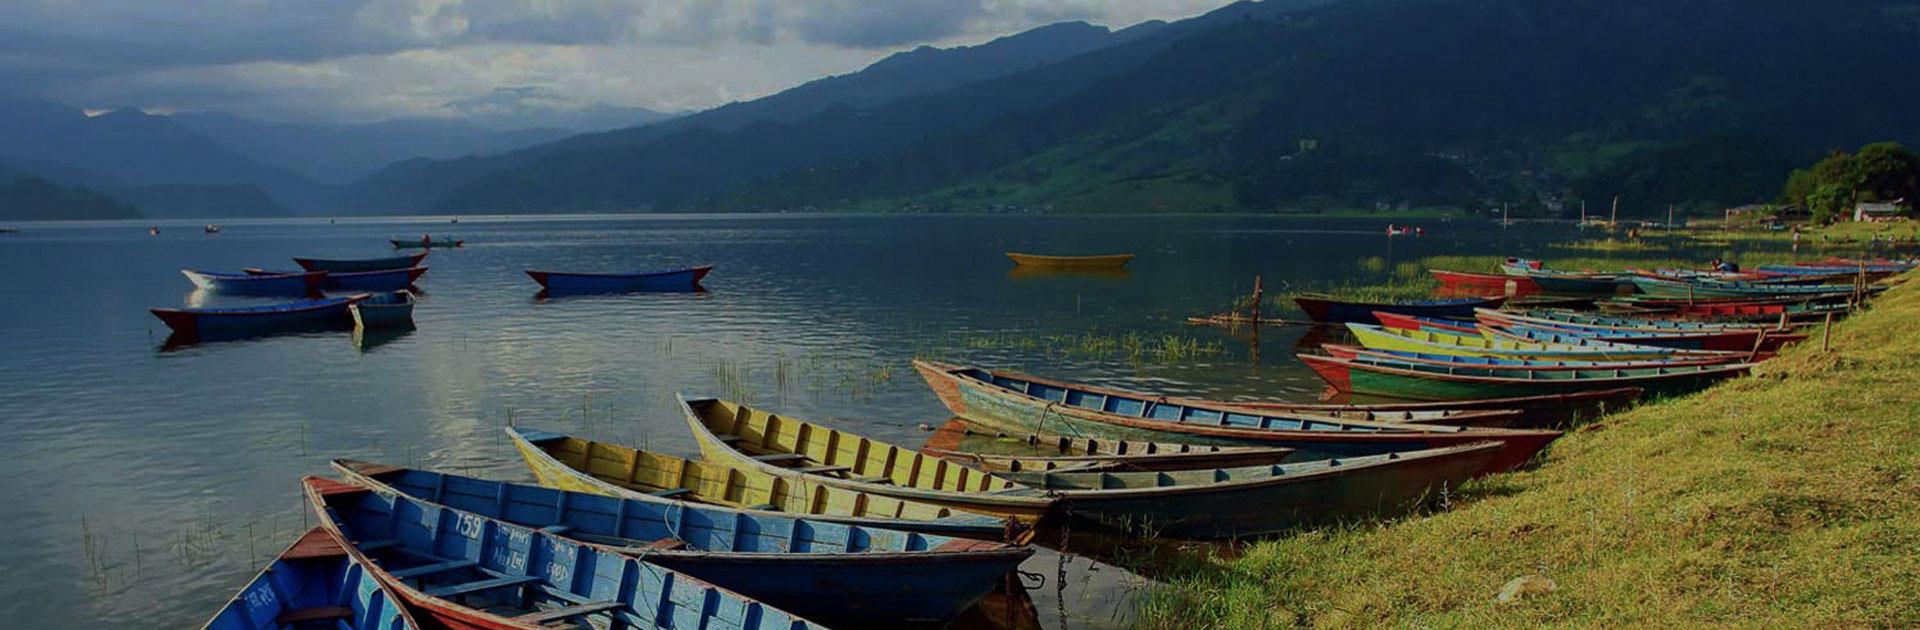 NP Nepal Grandes Paisajes y Trekking 12 días 7